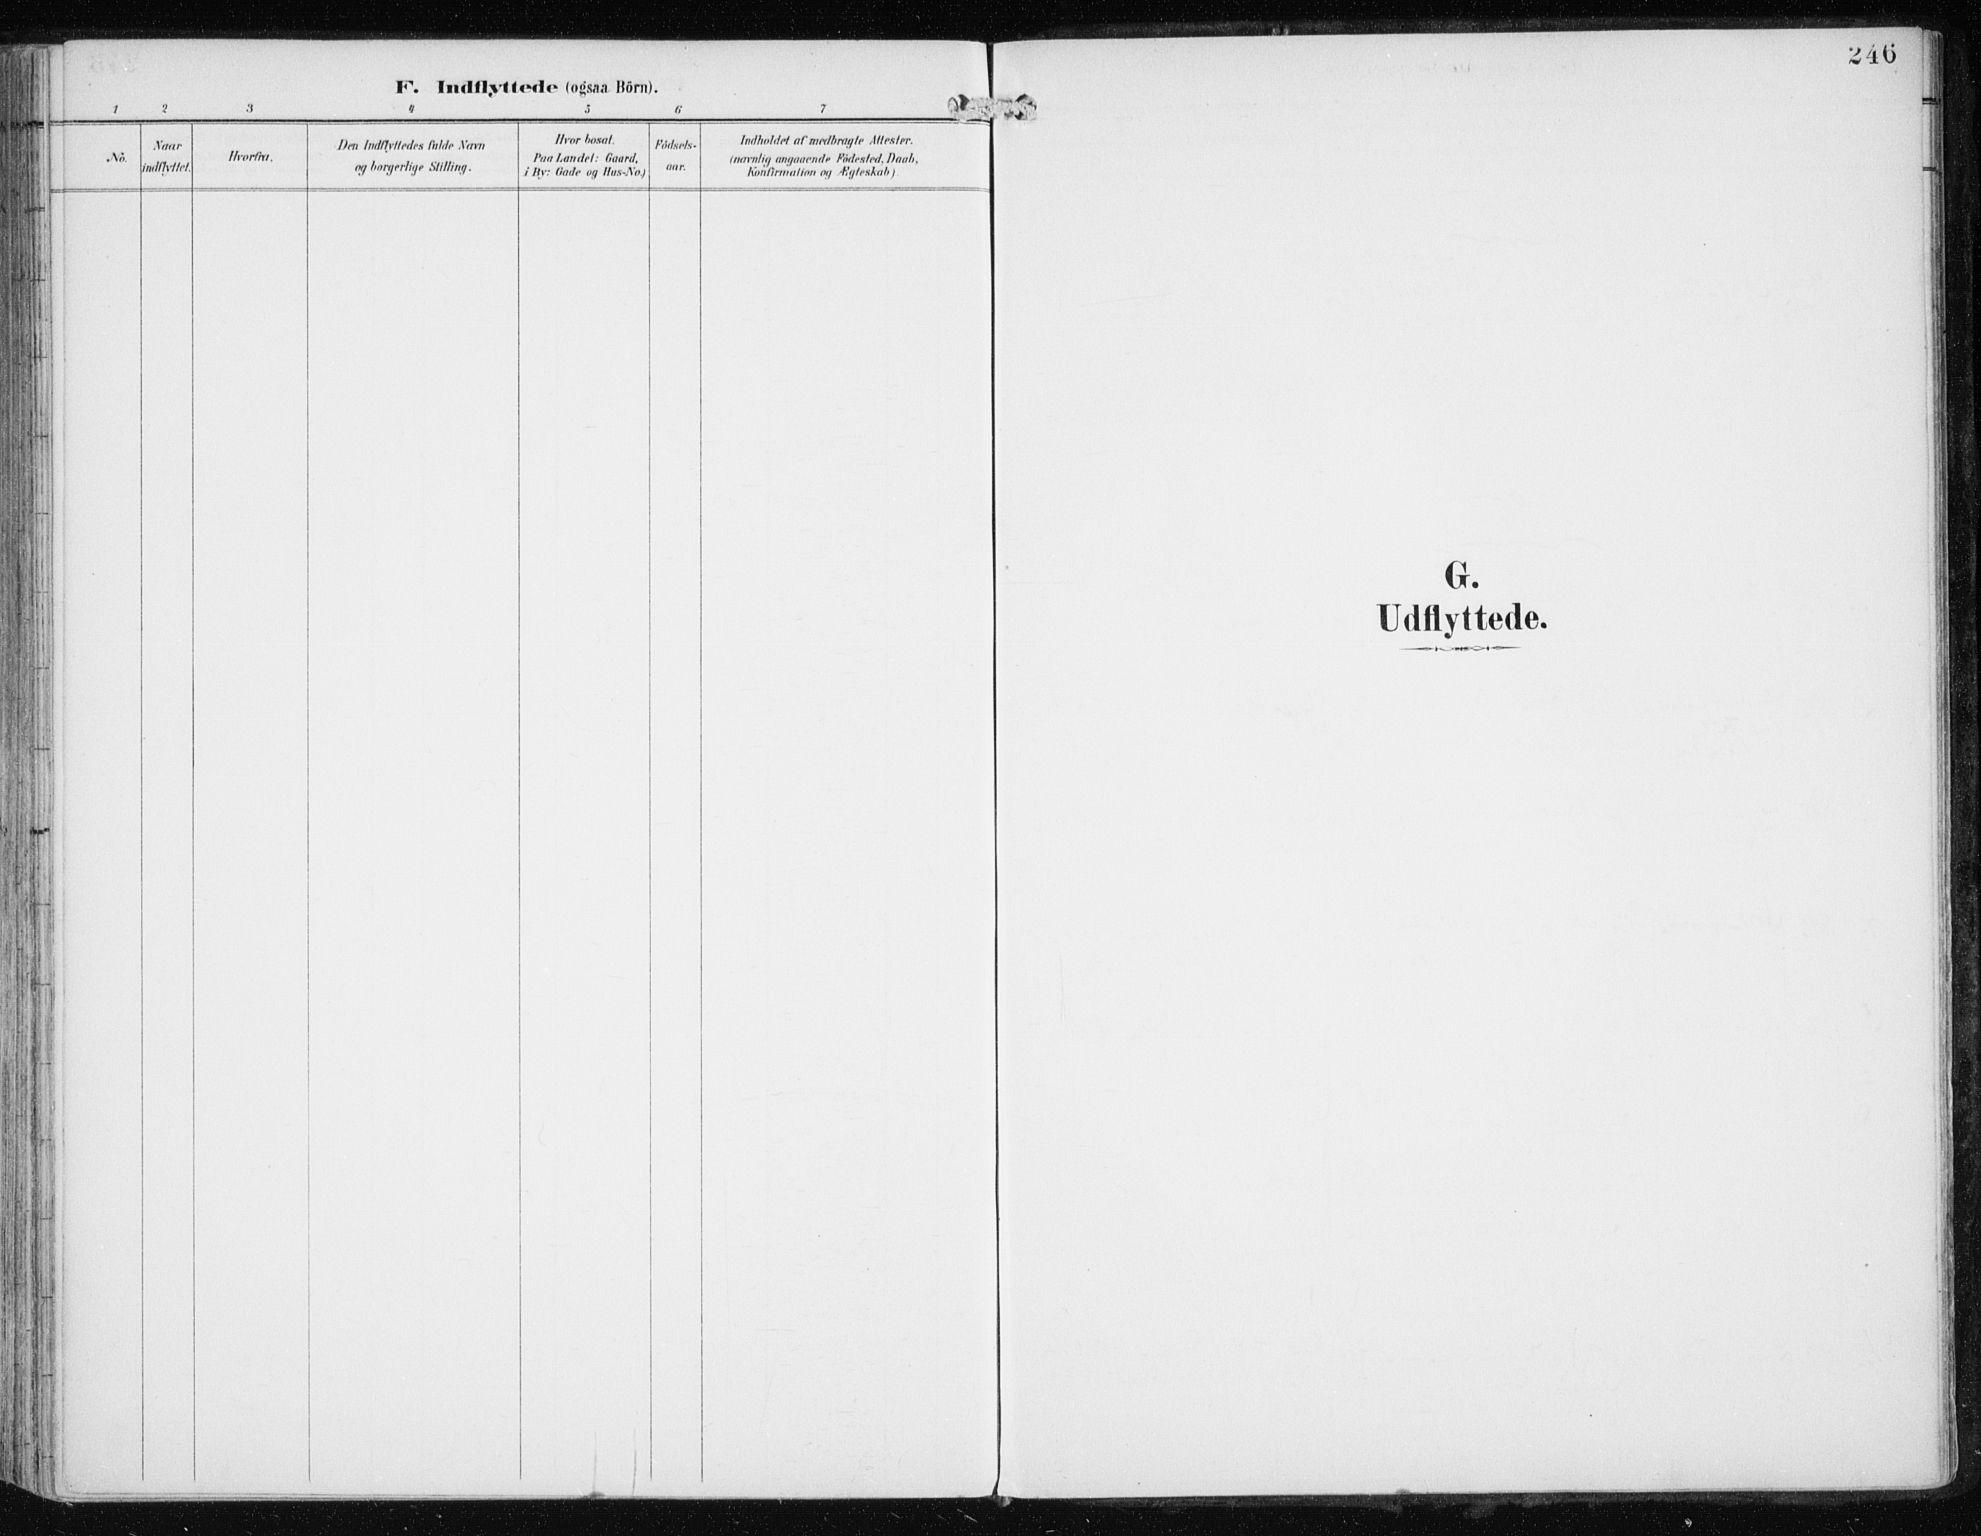 SATØ, Skjervøy sokneprestkontor, H/Ha/Haa/L0017kirke: Ministerialbok nr. 17, 1895-1911, s. 246